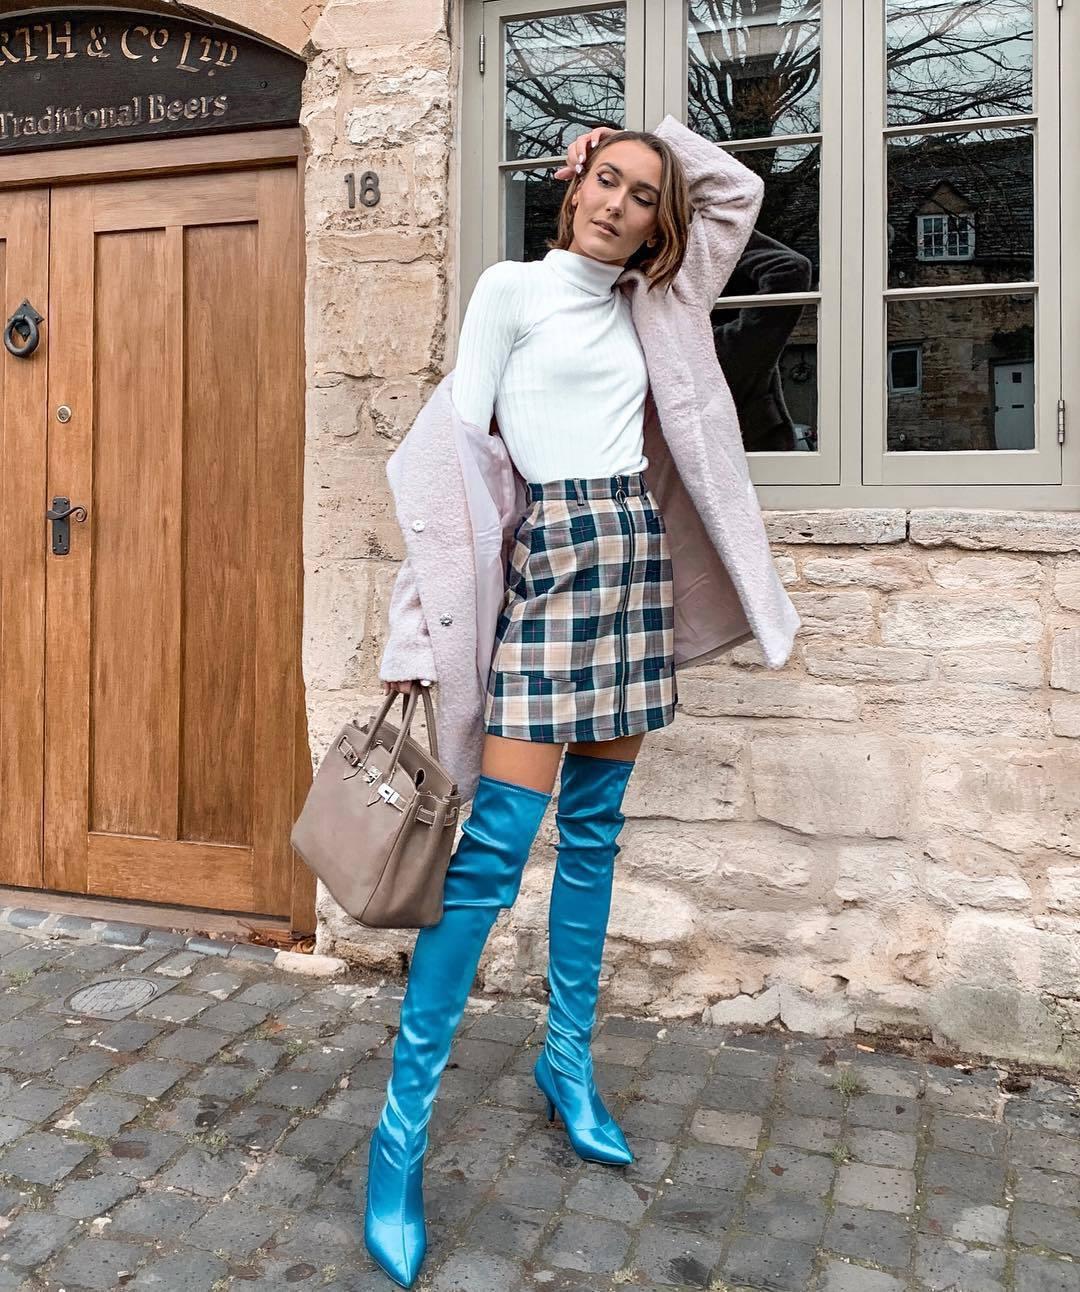 shoes over the knee boots blue boots heel boots sock boots plaid skirt mini skirt handbag white turtleneck top coat